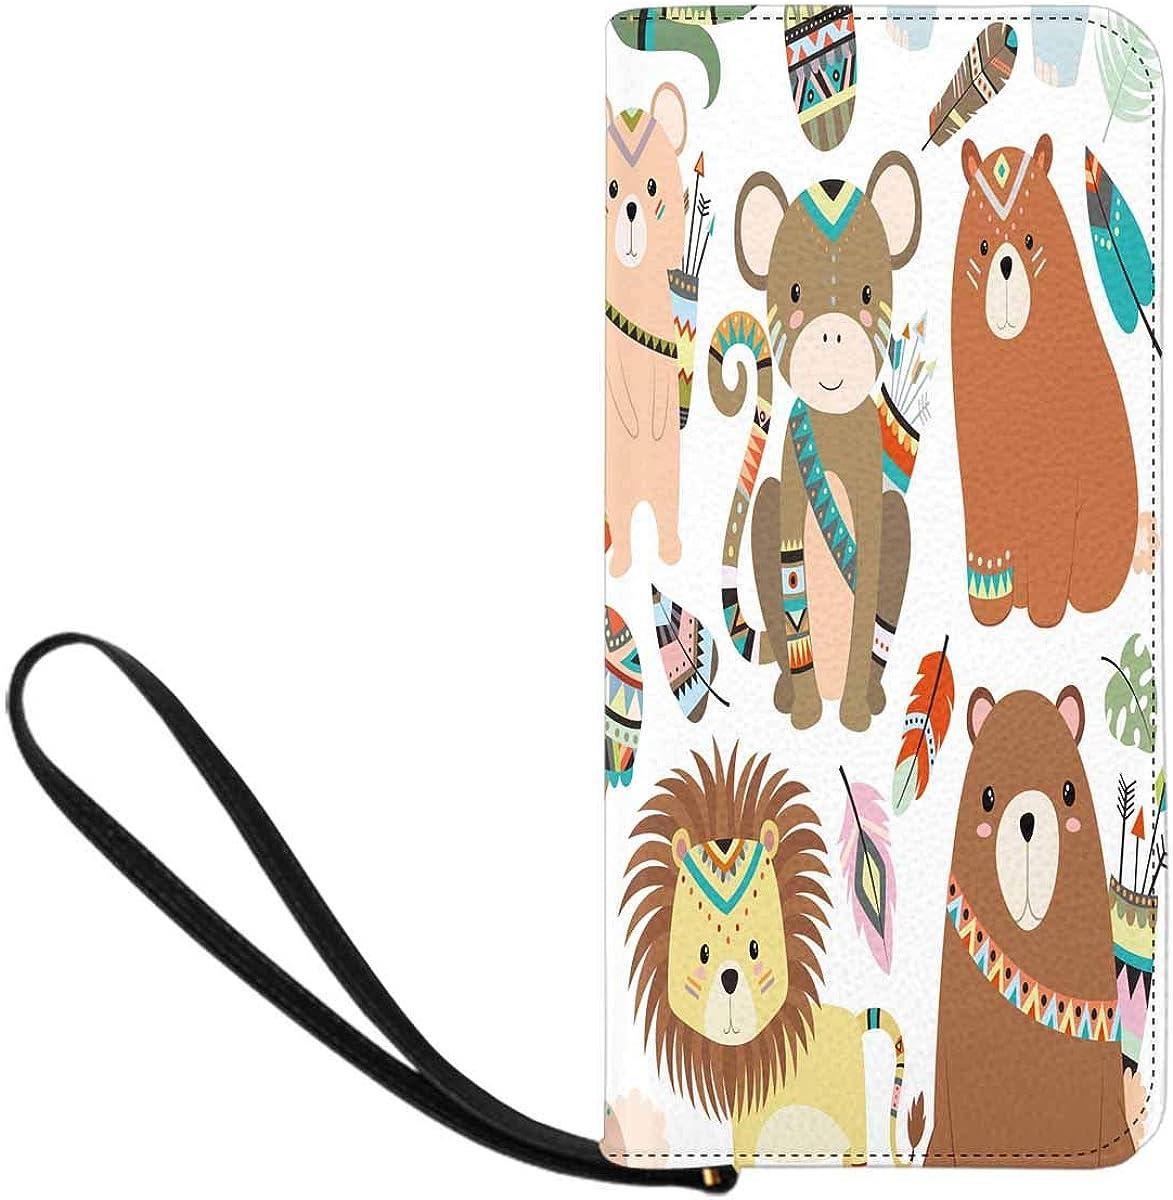 INTERESTPRINT Woodland and Jungle Tribal Animals Clutch Wallet Handbag for Party Wedding